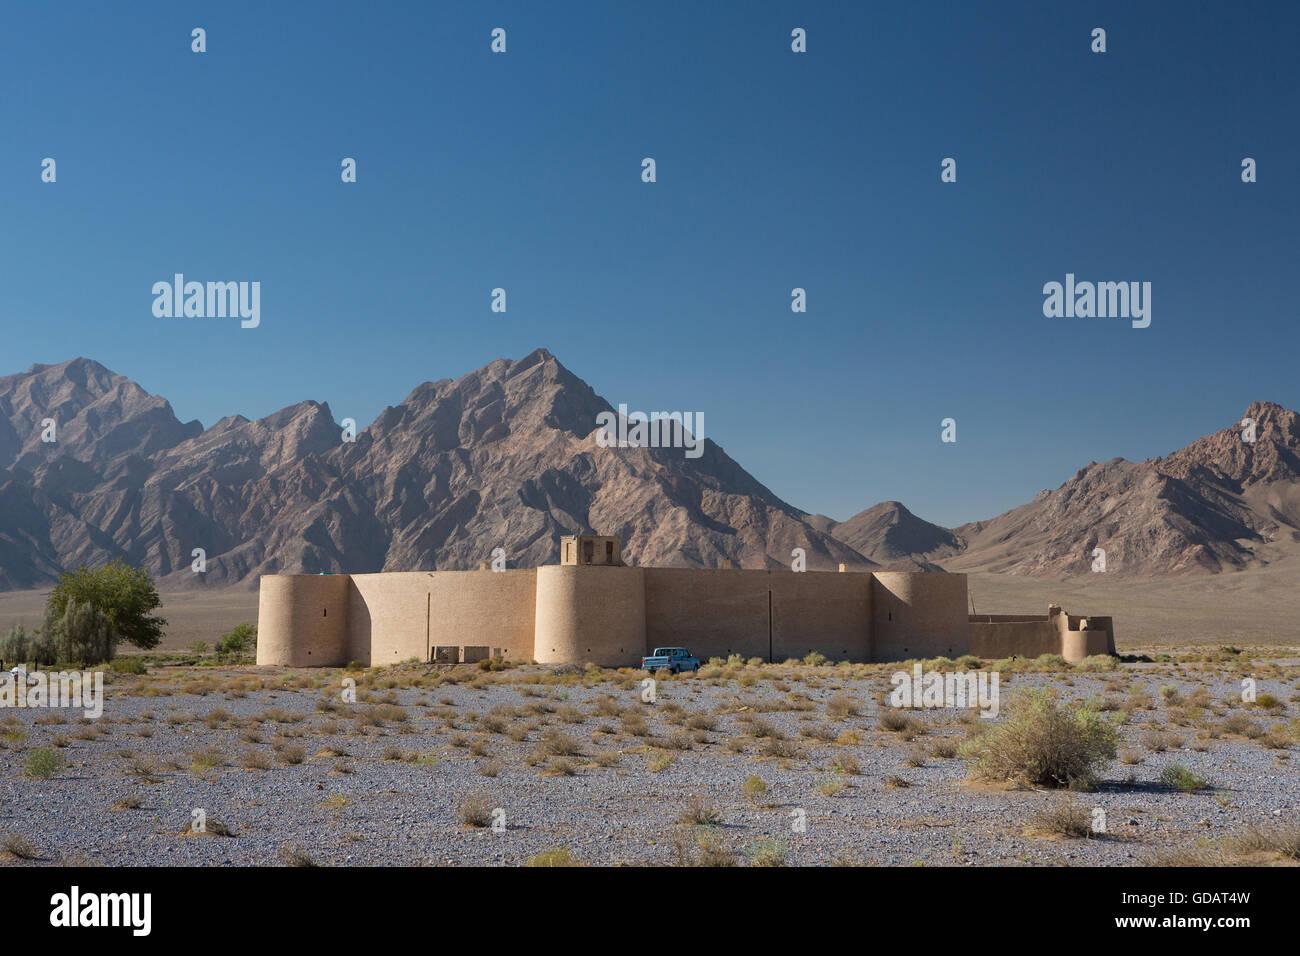 Iran,Near Yazd City,Zayn al Din Caravanserai. (round caravanserai) - Stock Image